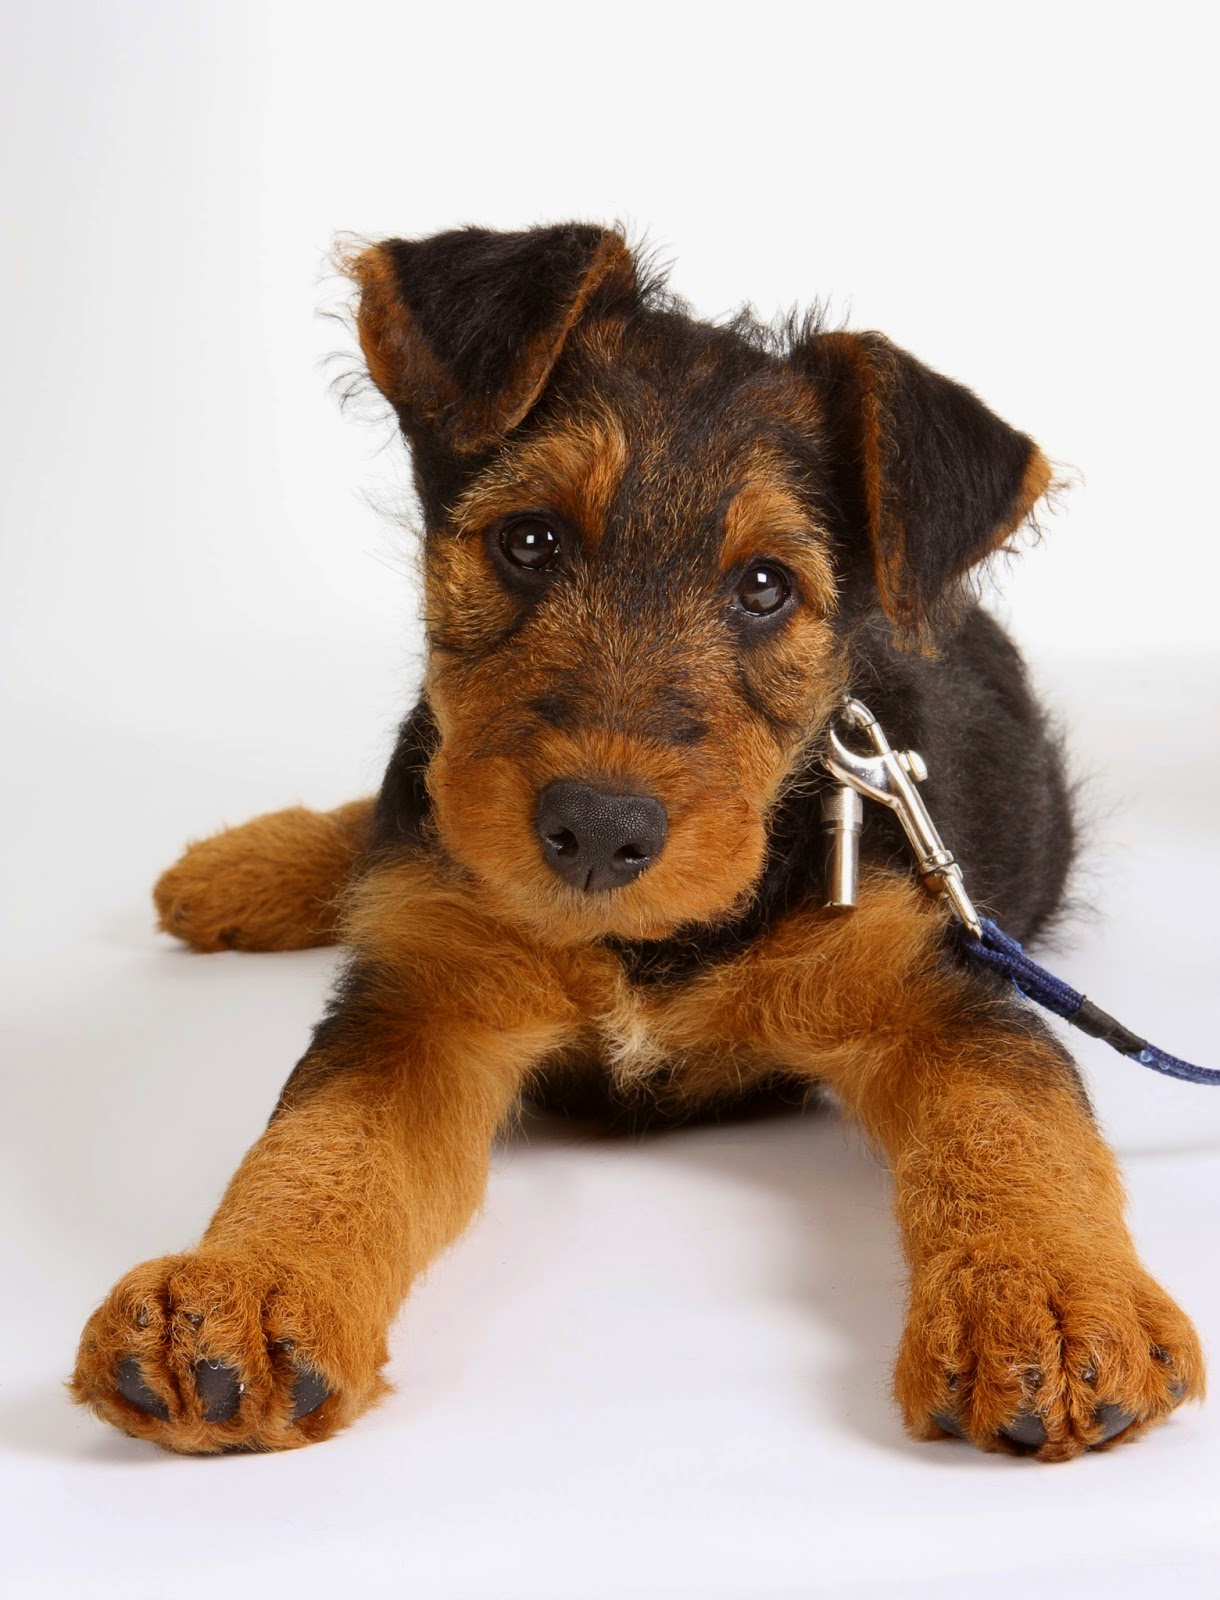 how to potty train a puppy, how to potty train a puppy fast, how to potty train dog, how to train a dog